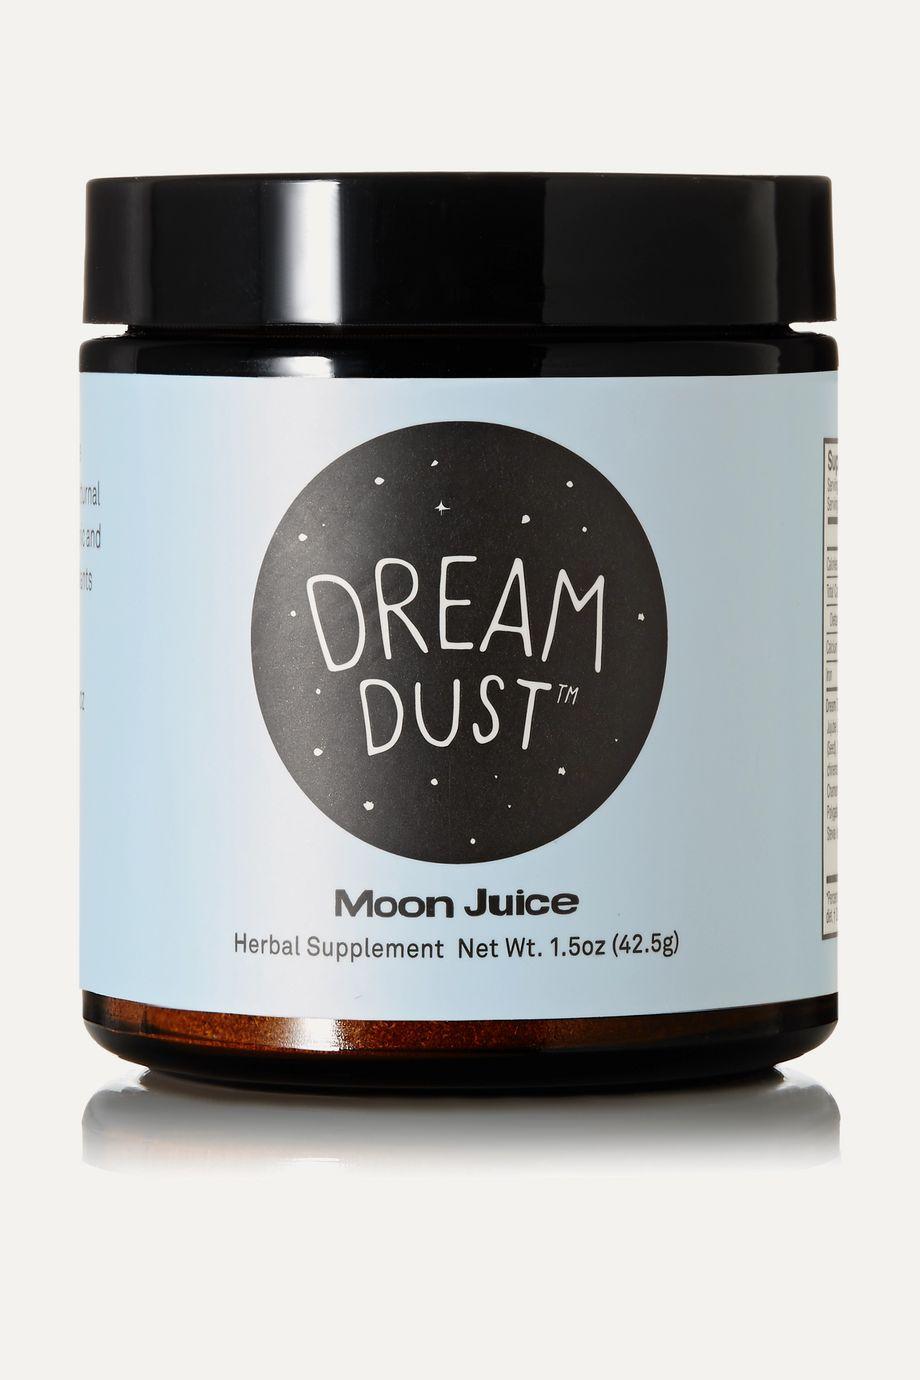 Moon Juice Dream Dust, 42.5g